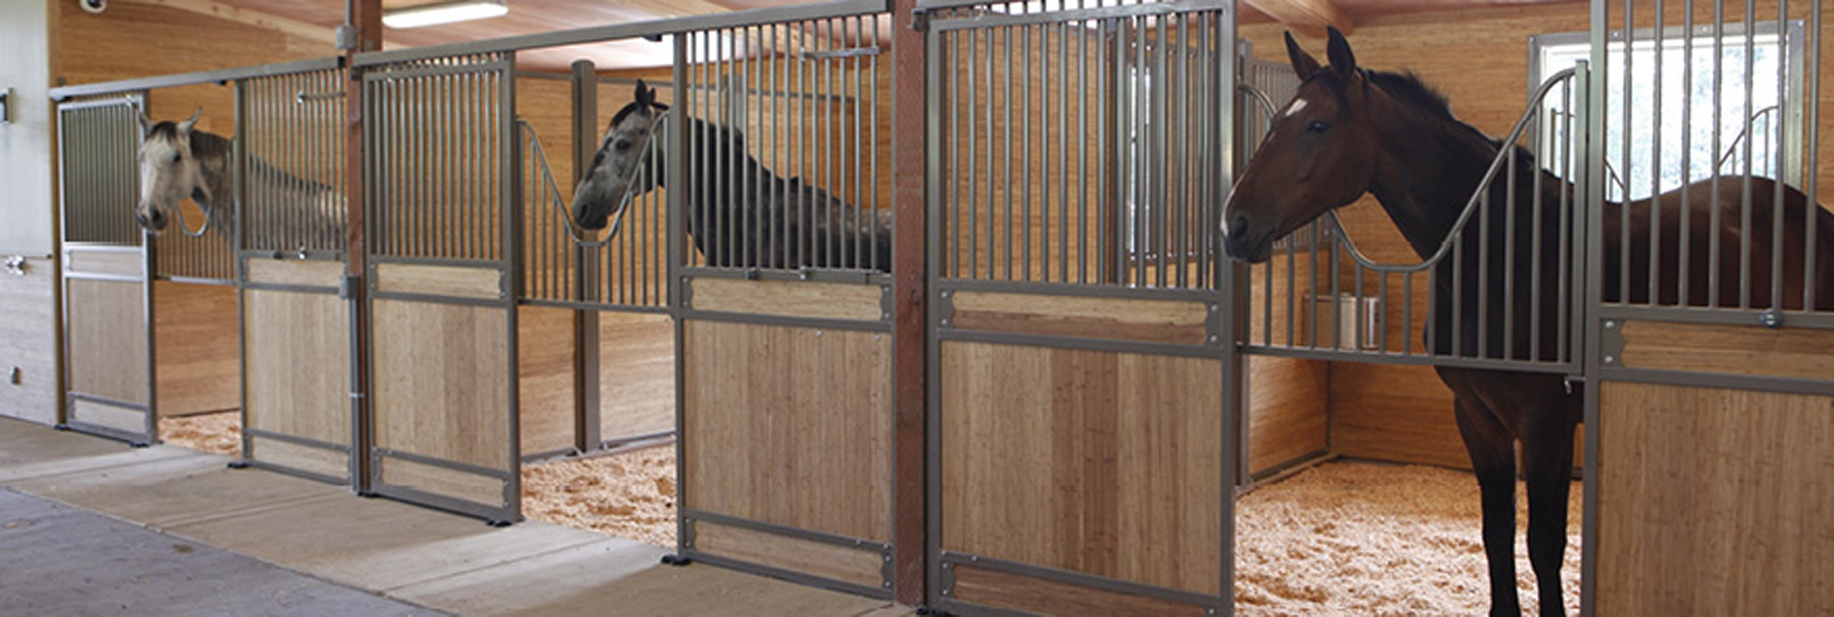 Sliding Stall Door DesignsSliding Stall Door Designs